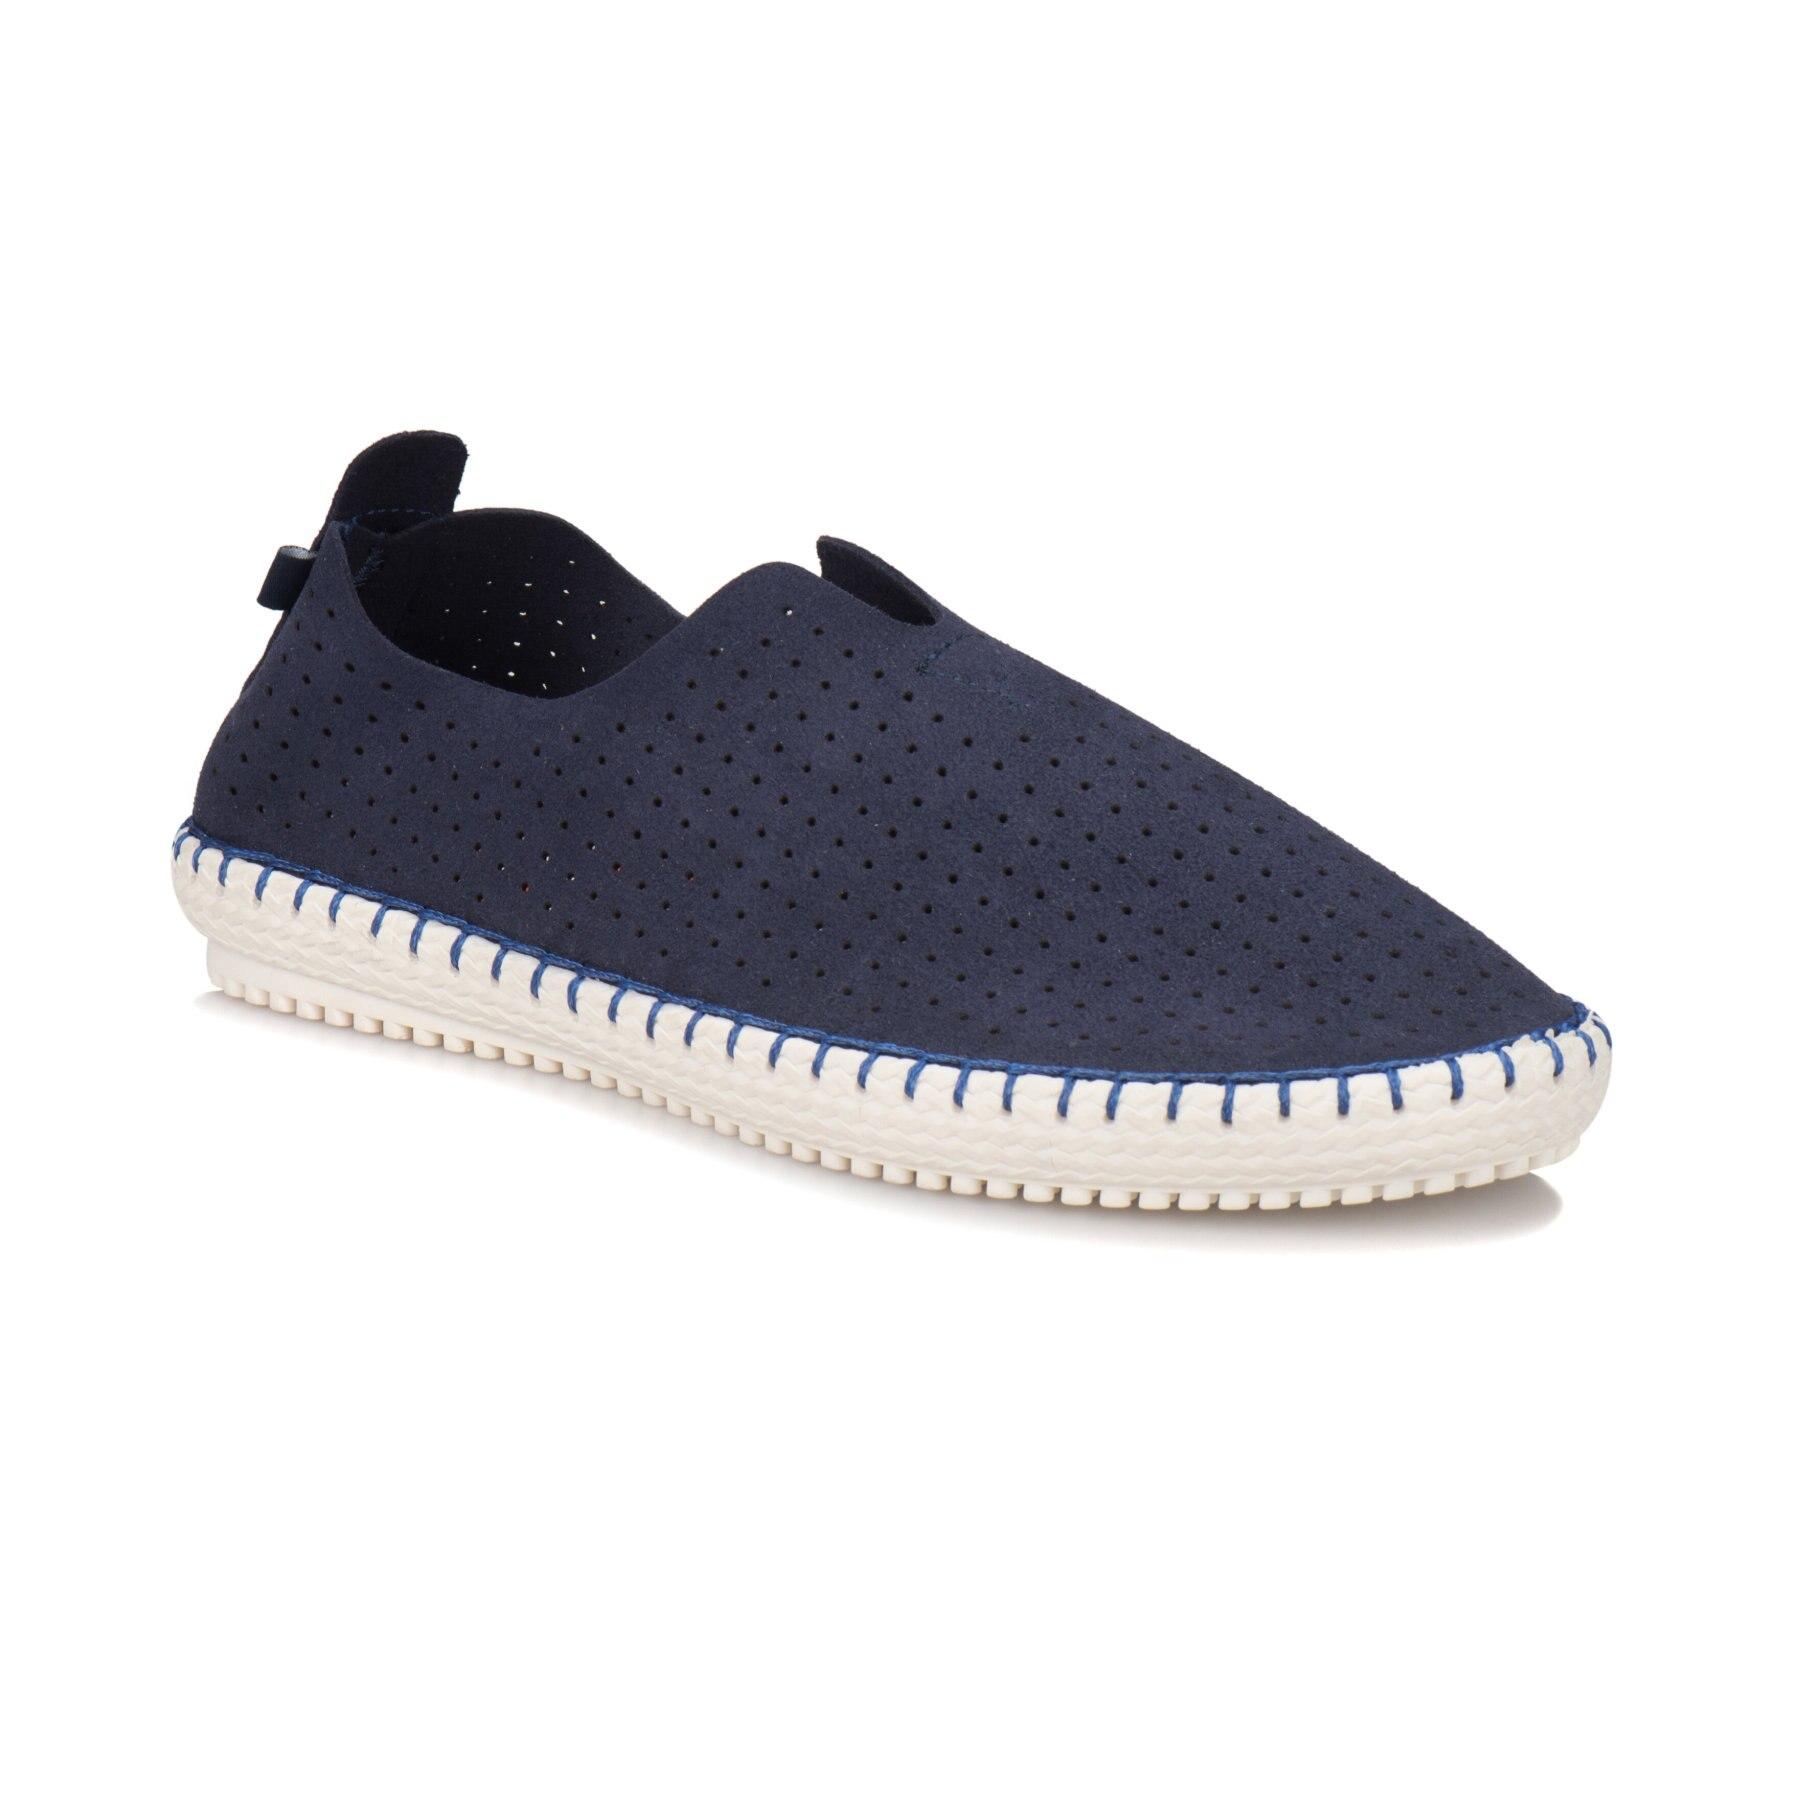 FLO REYNO Navy Blue Men 'S Shoes KINETIX